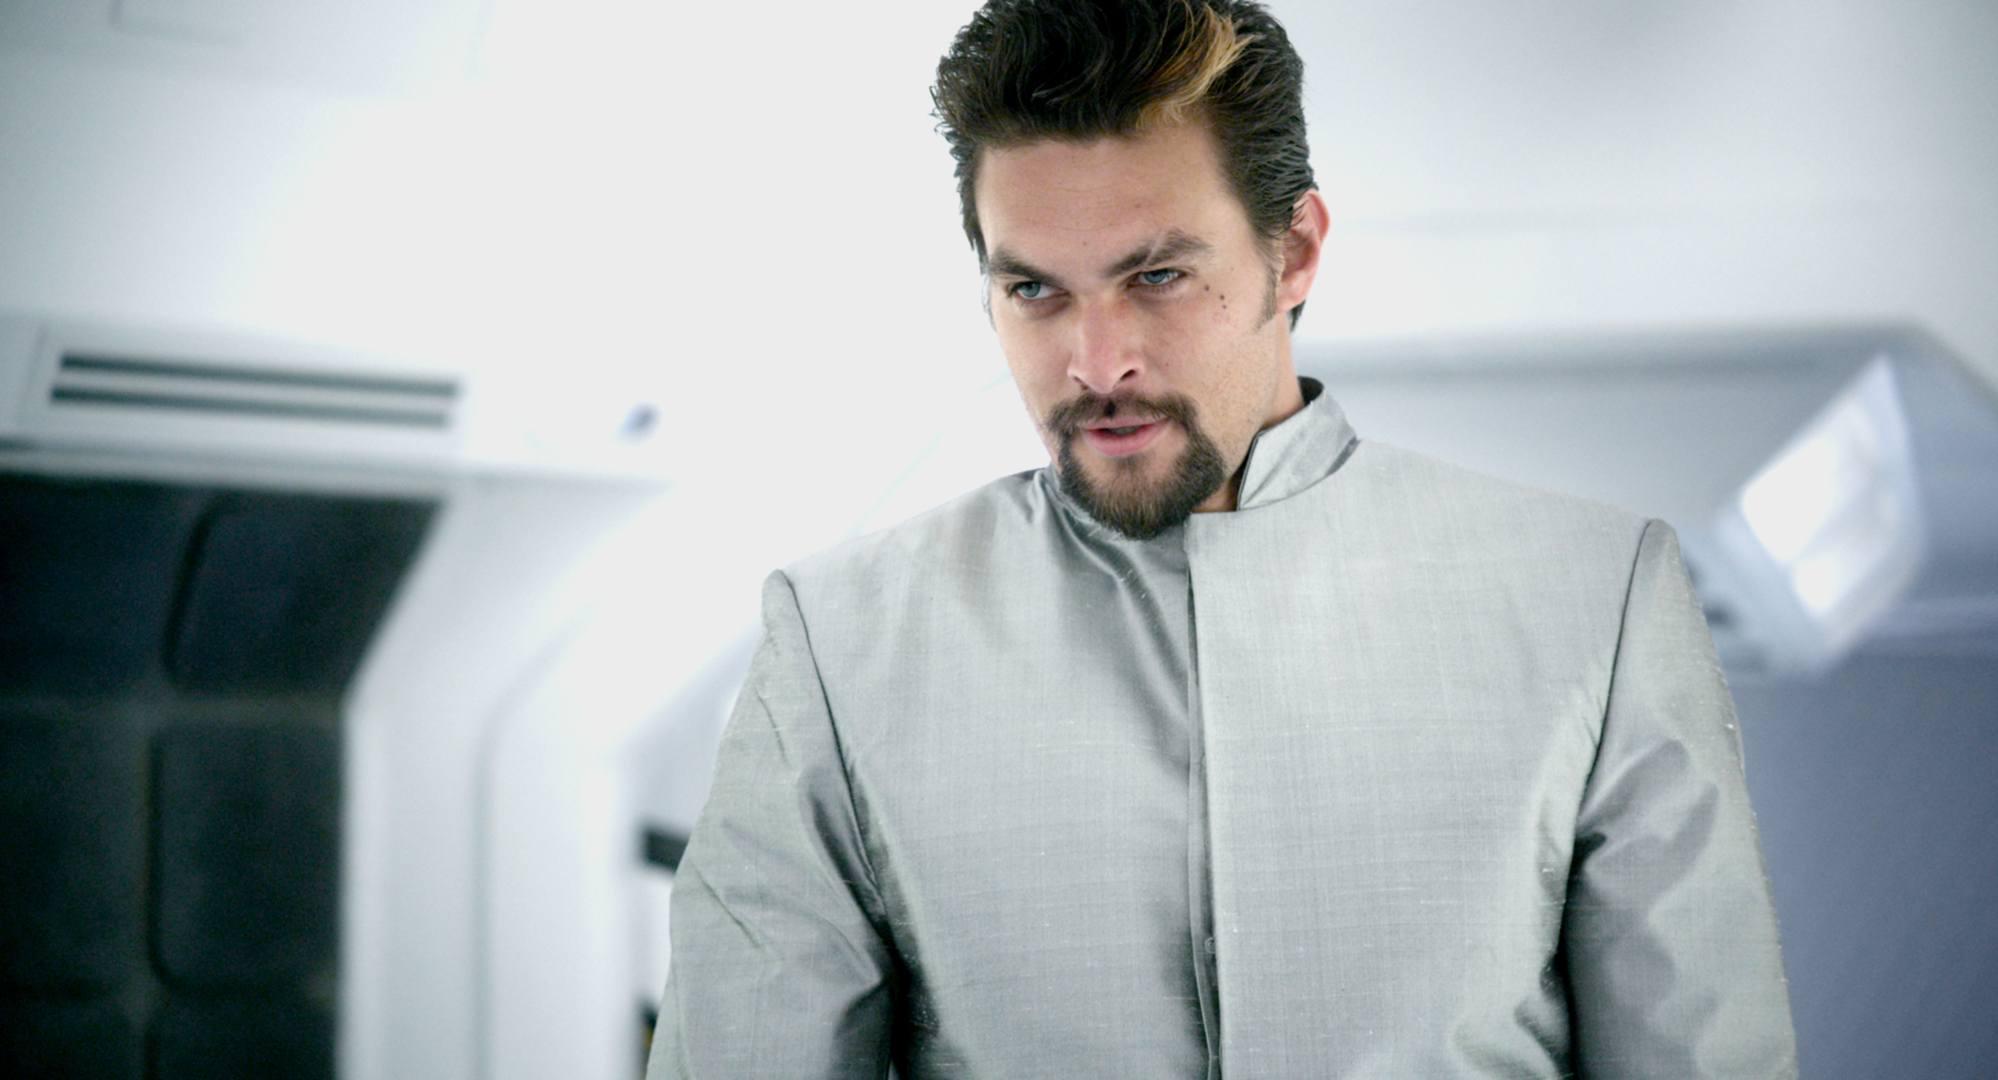 Jason Momoa as the malevolent A.I. I Am in Debug (2014)